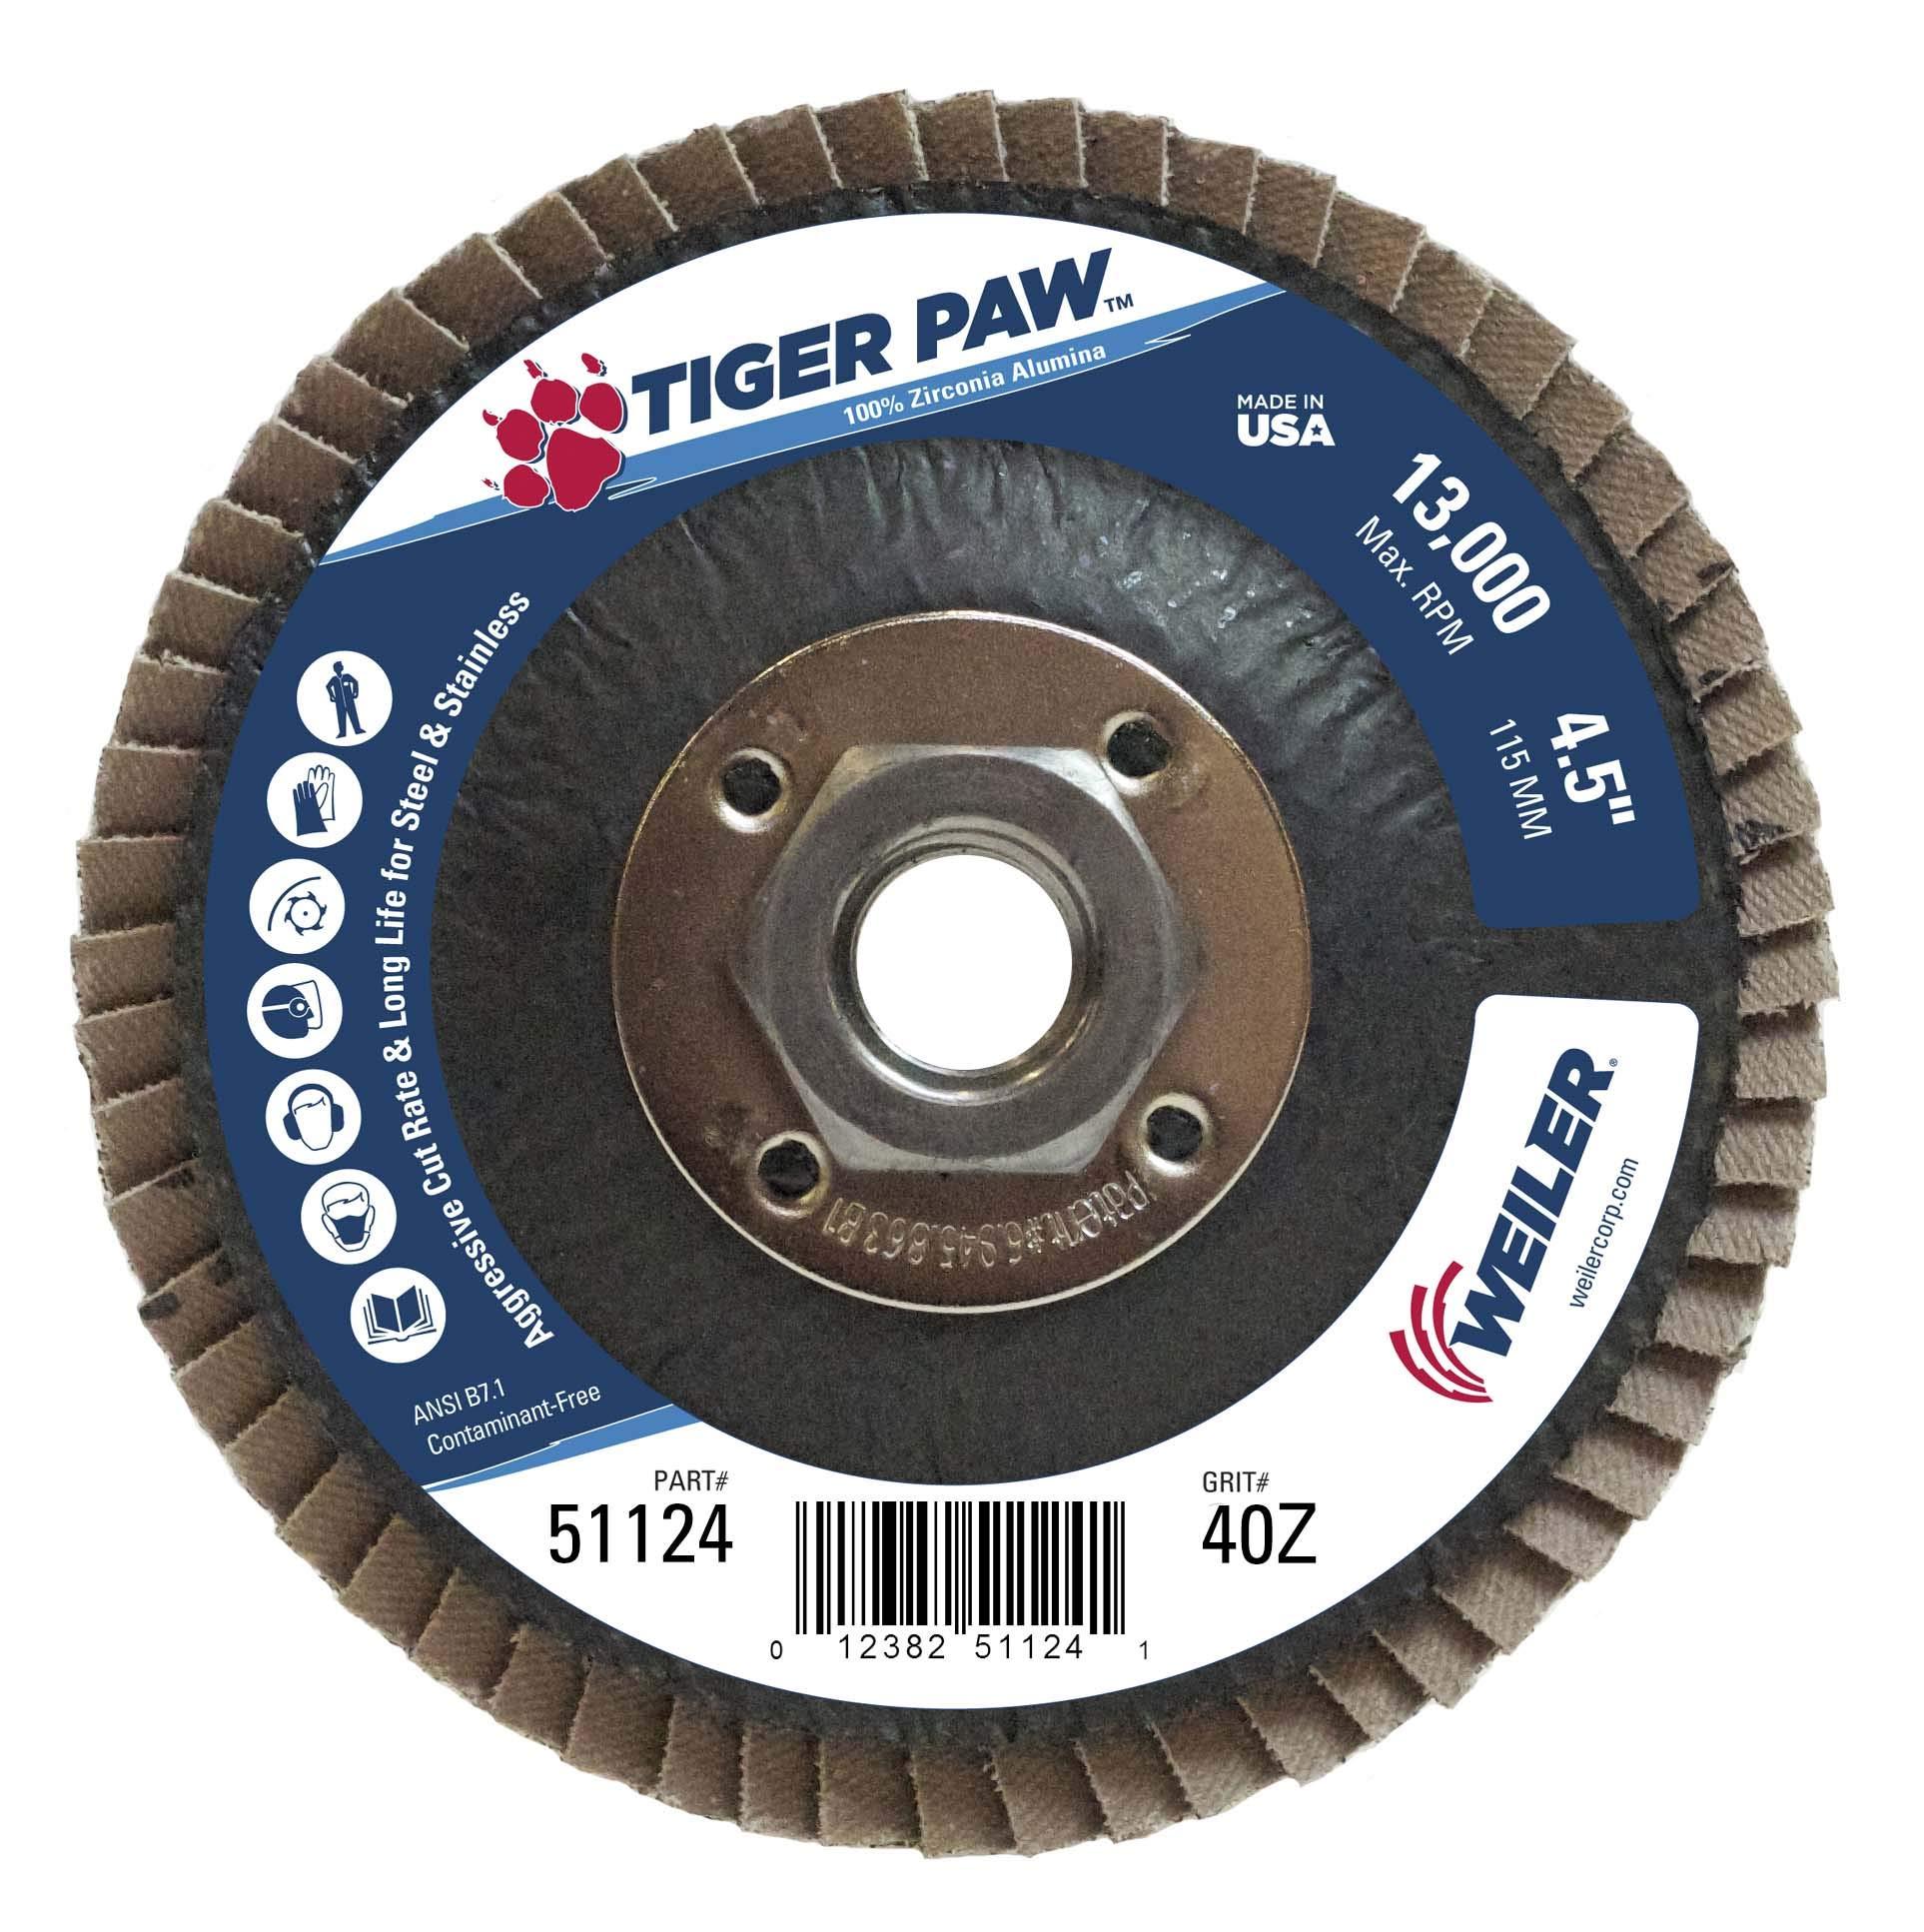 Weiler 51124 Tiger Paw High Performance Abrasive Flap Disc, Type 29 Angled Style, Phenolic Backing, Zirconia Alumina, 4-1/2'' Diameter, 5/8''-11 Arbor, 40 Grit, 13000 RPM (Pack of 10)